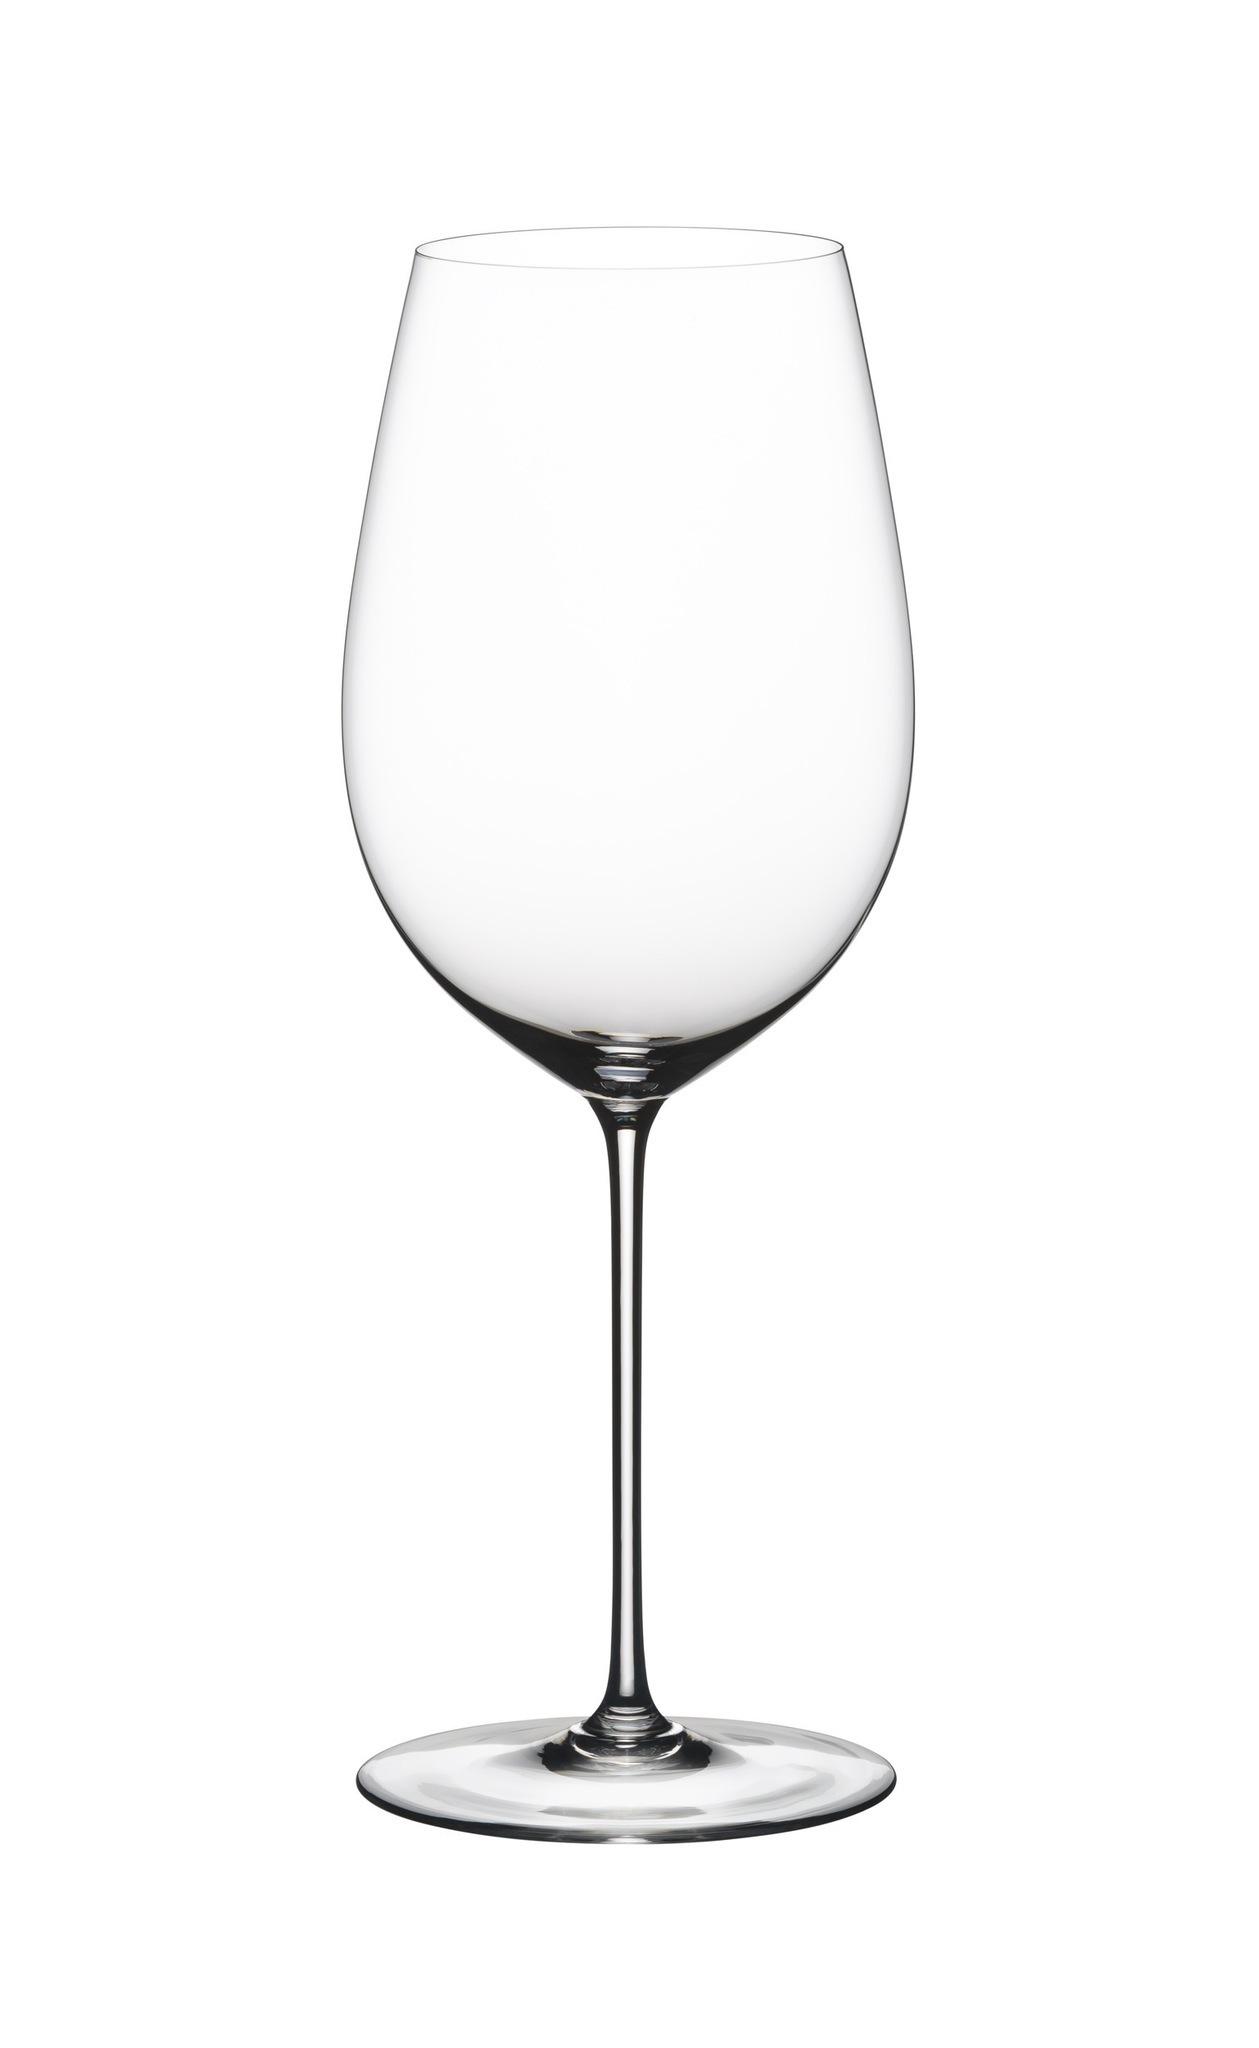 Бокал для вина Riedel Bordeaux Grand Cru, Riedel Superleggero, 890 мл